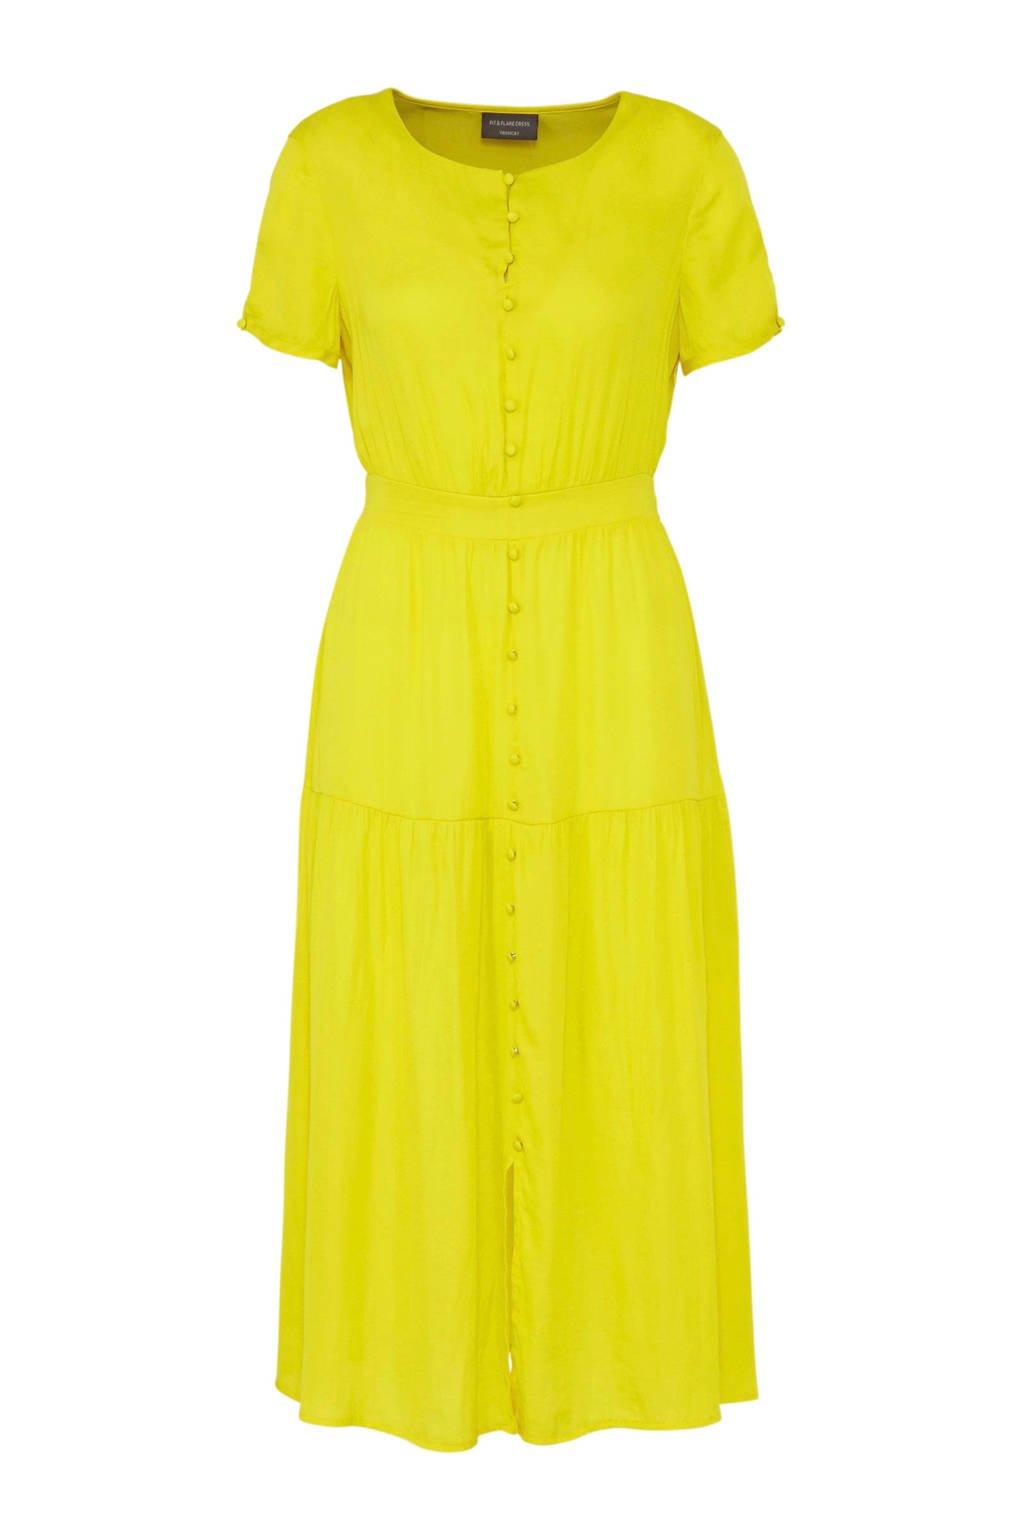 C&A Yessica jurk geel, Geel